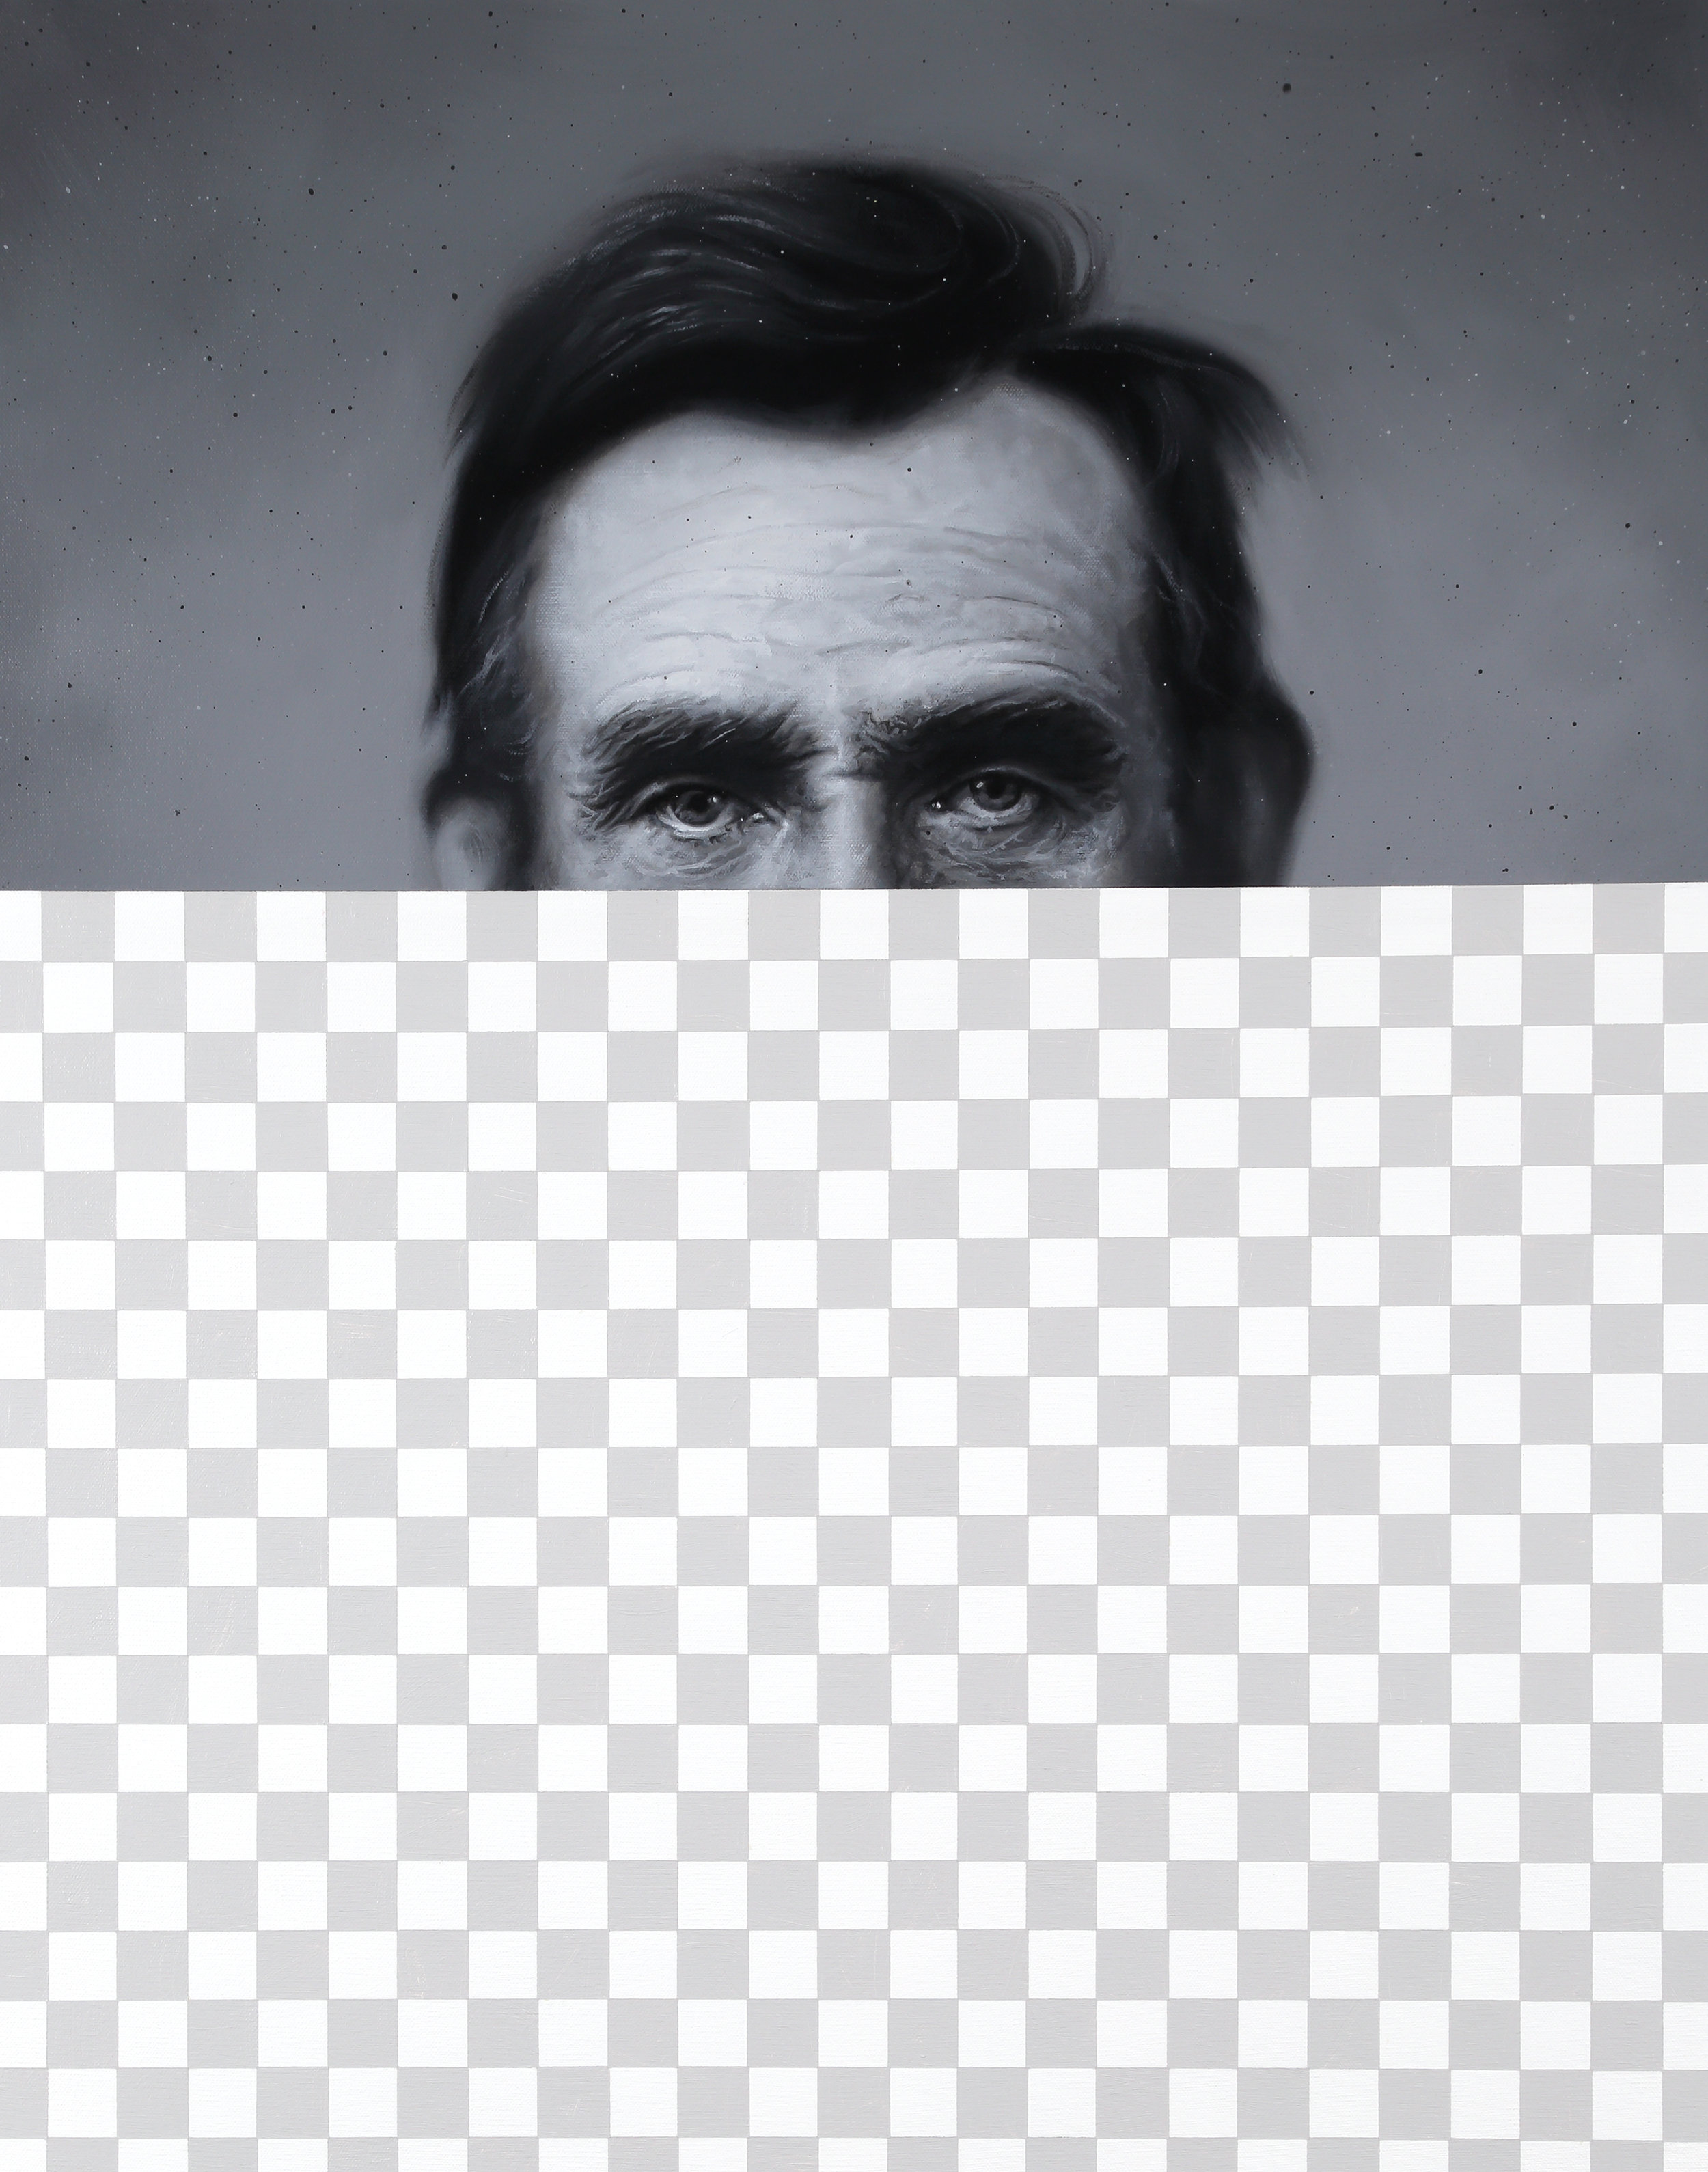 KContemporaryArt_Huckins_Swoon (Abraham Lincoln, Erasure No. 31)_2019_AcrylicOnCanvas_PRICE.jpg